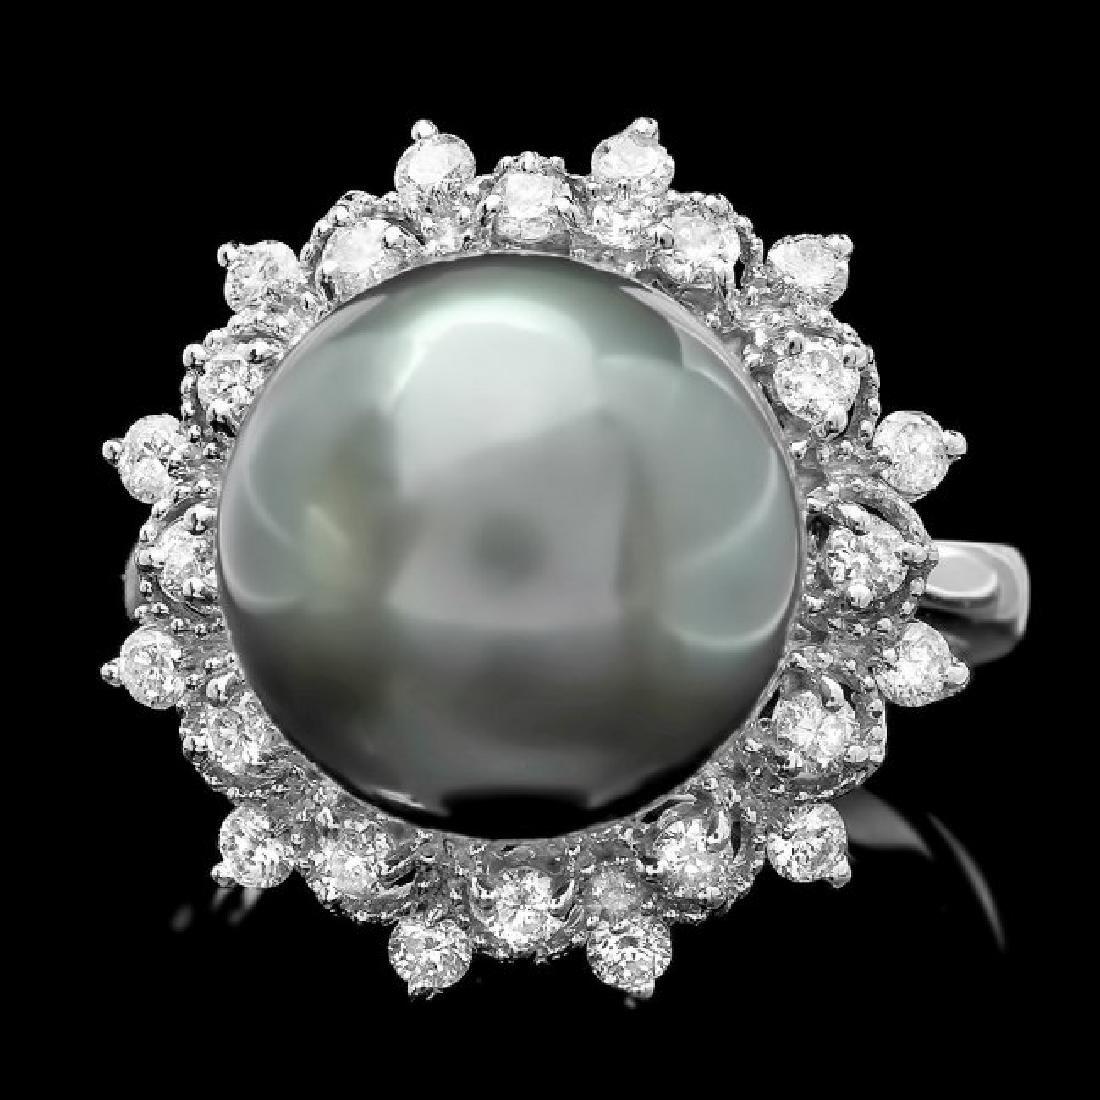 14k White Gold 12.5mm Pearl 0.60ct Diamond Ring